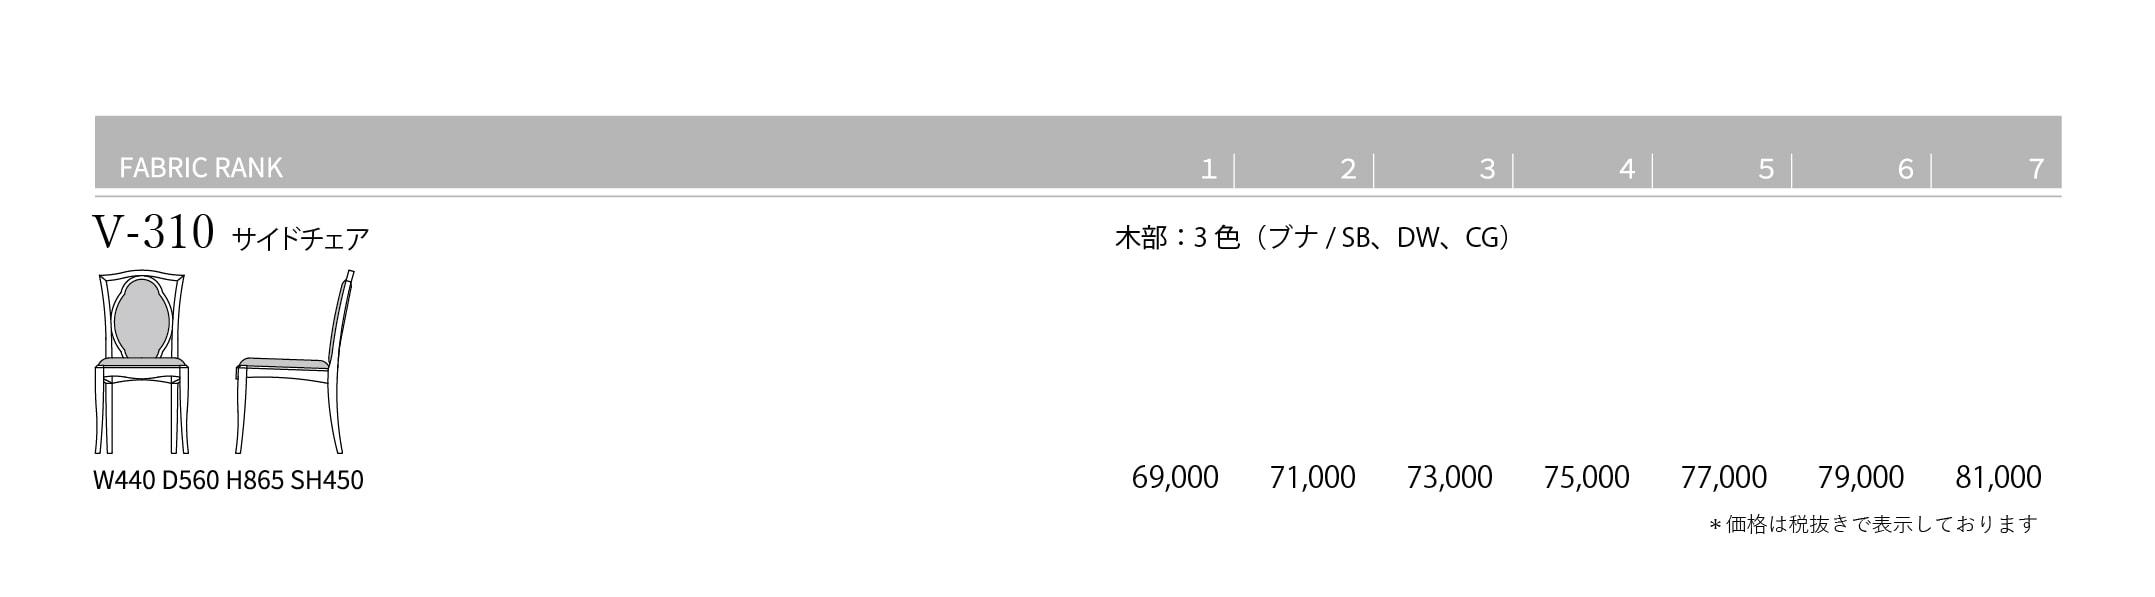 V-310 Price List